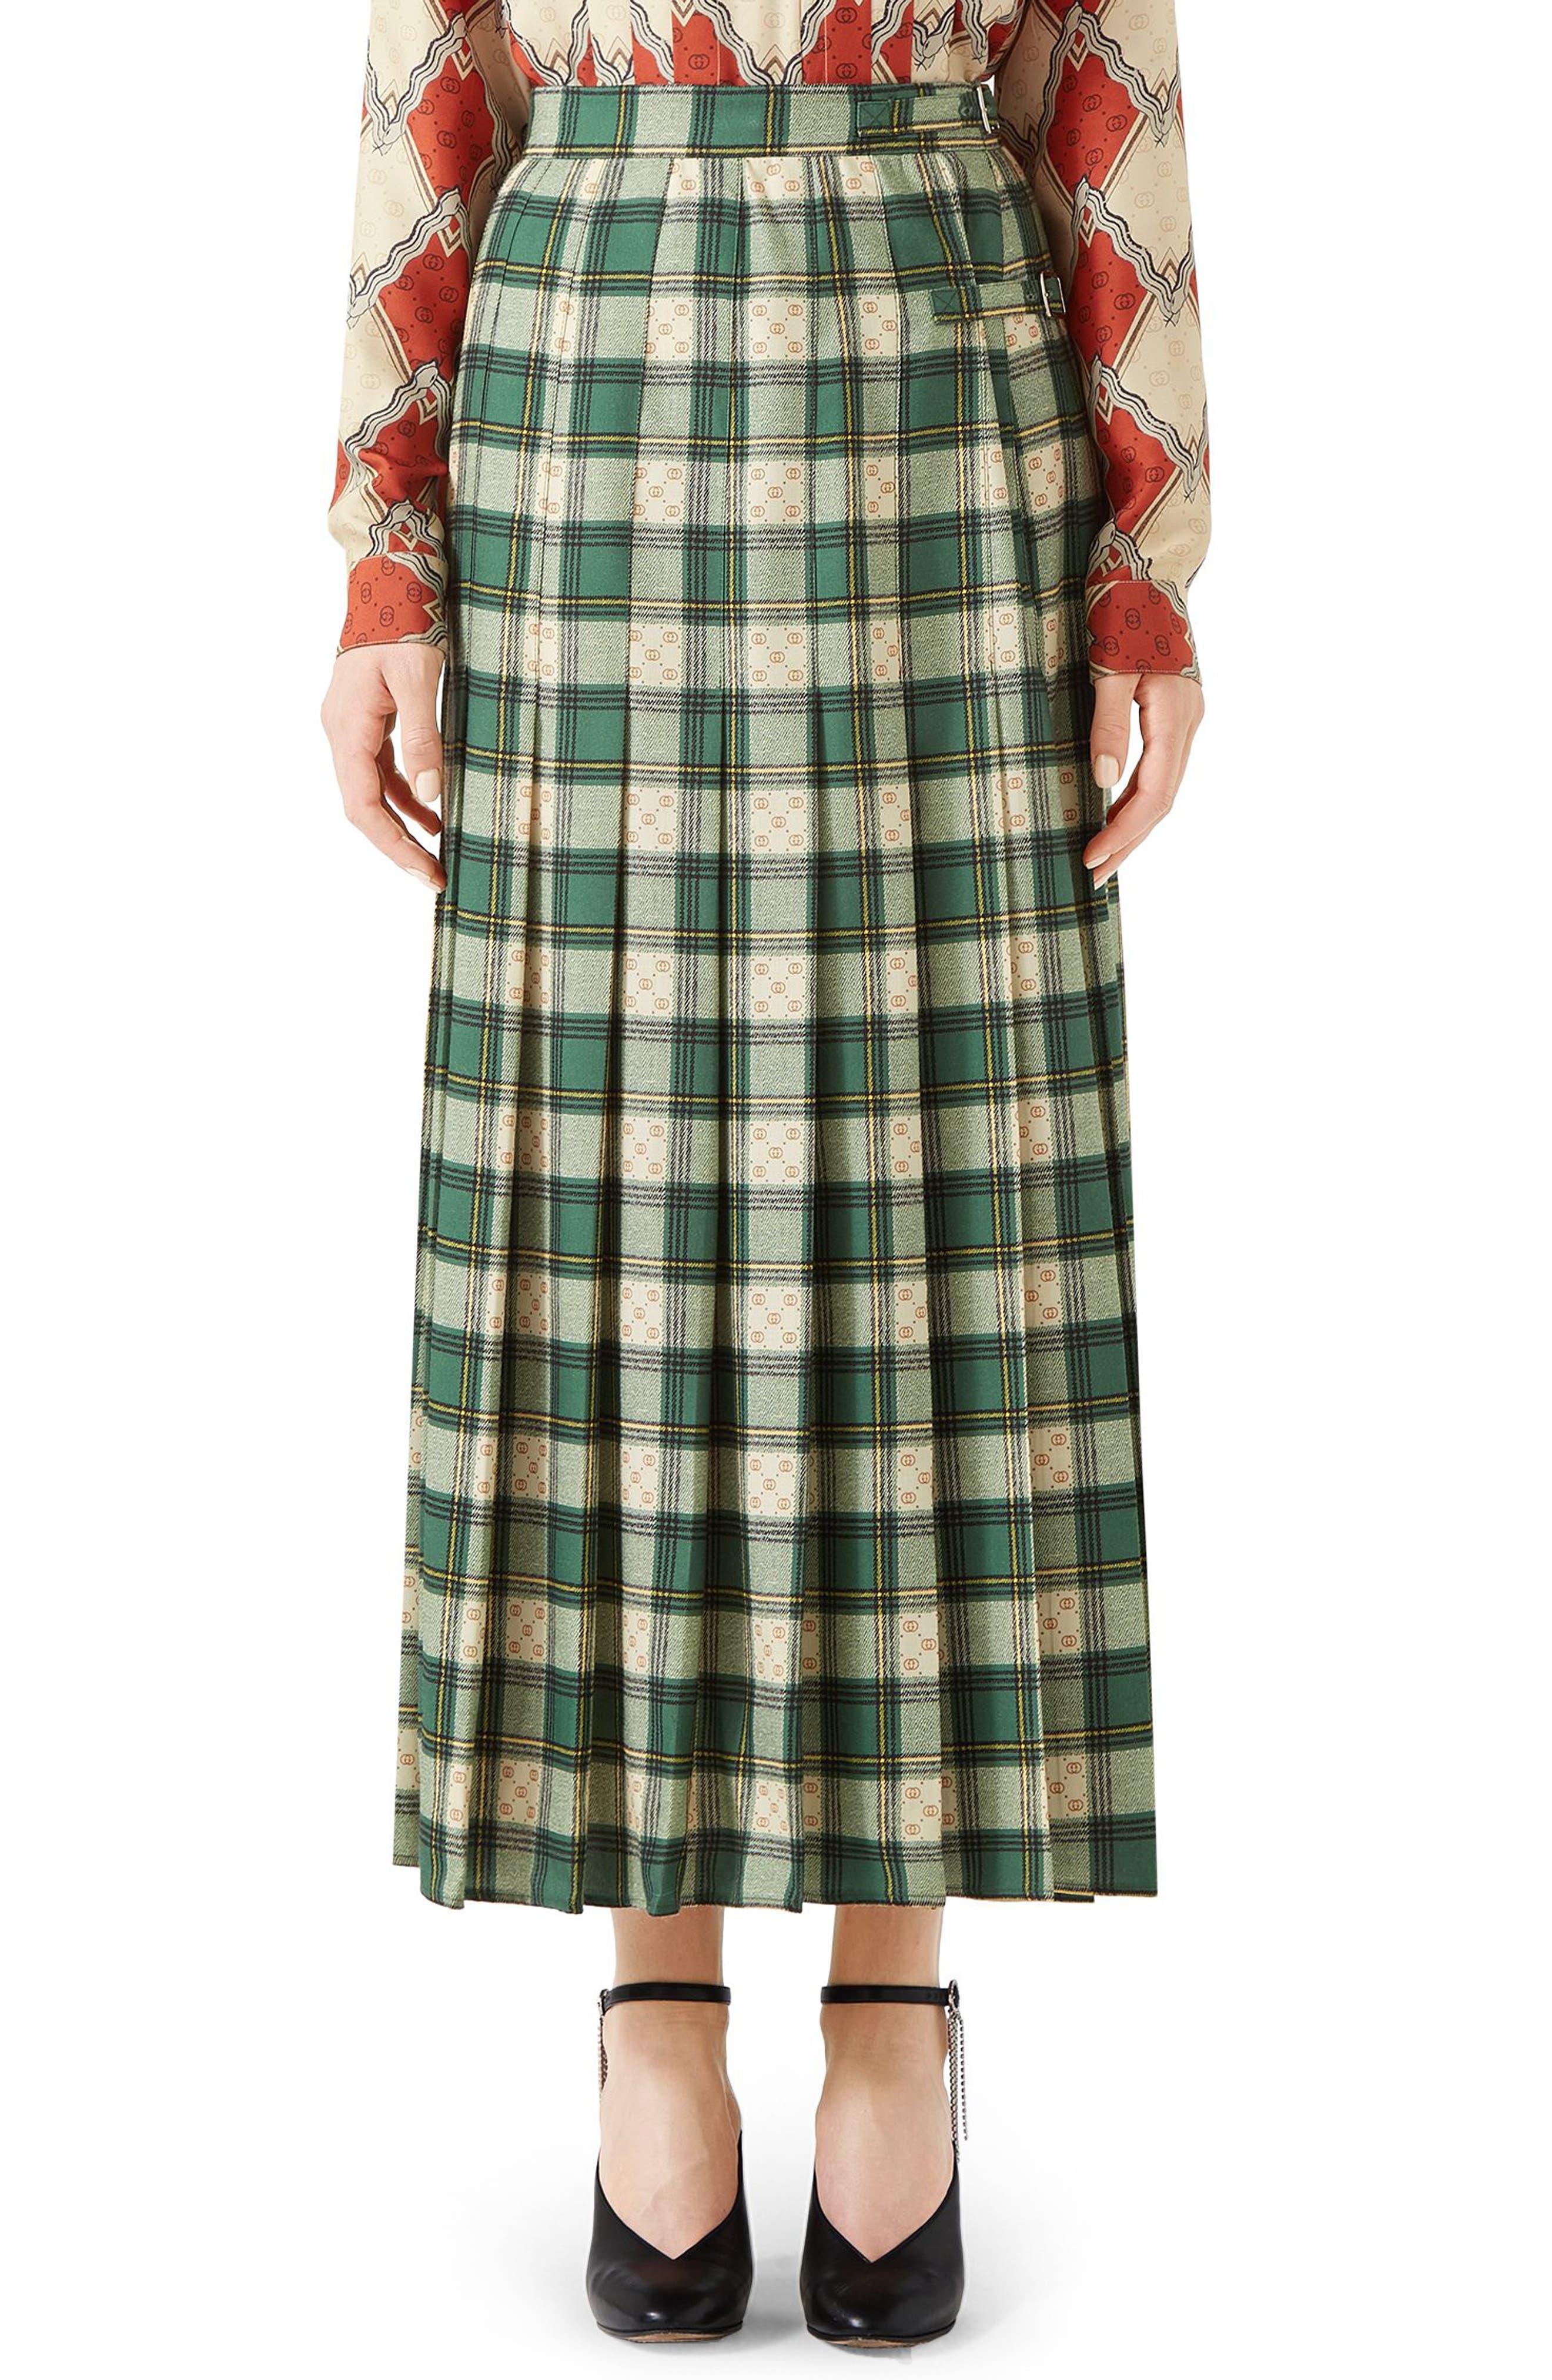 Tartan Check Wool Twill Maxi Skirt,                         Main,                         color, 3741 GREEN/ ROSE BEIGE PRI